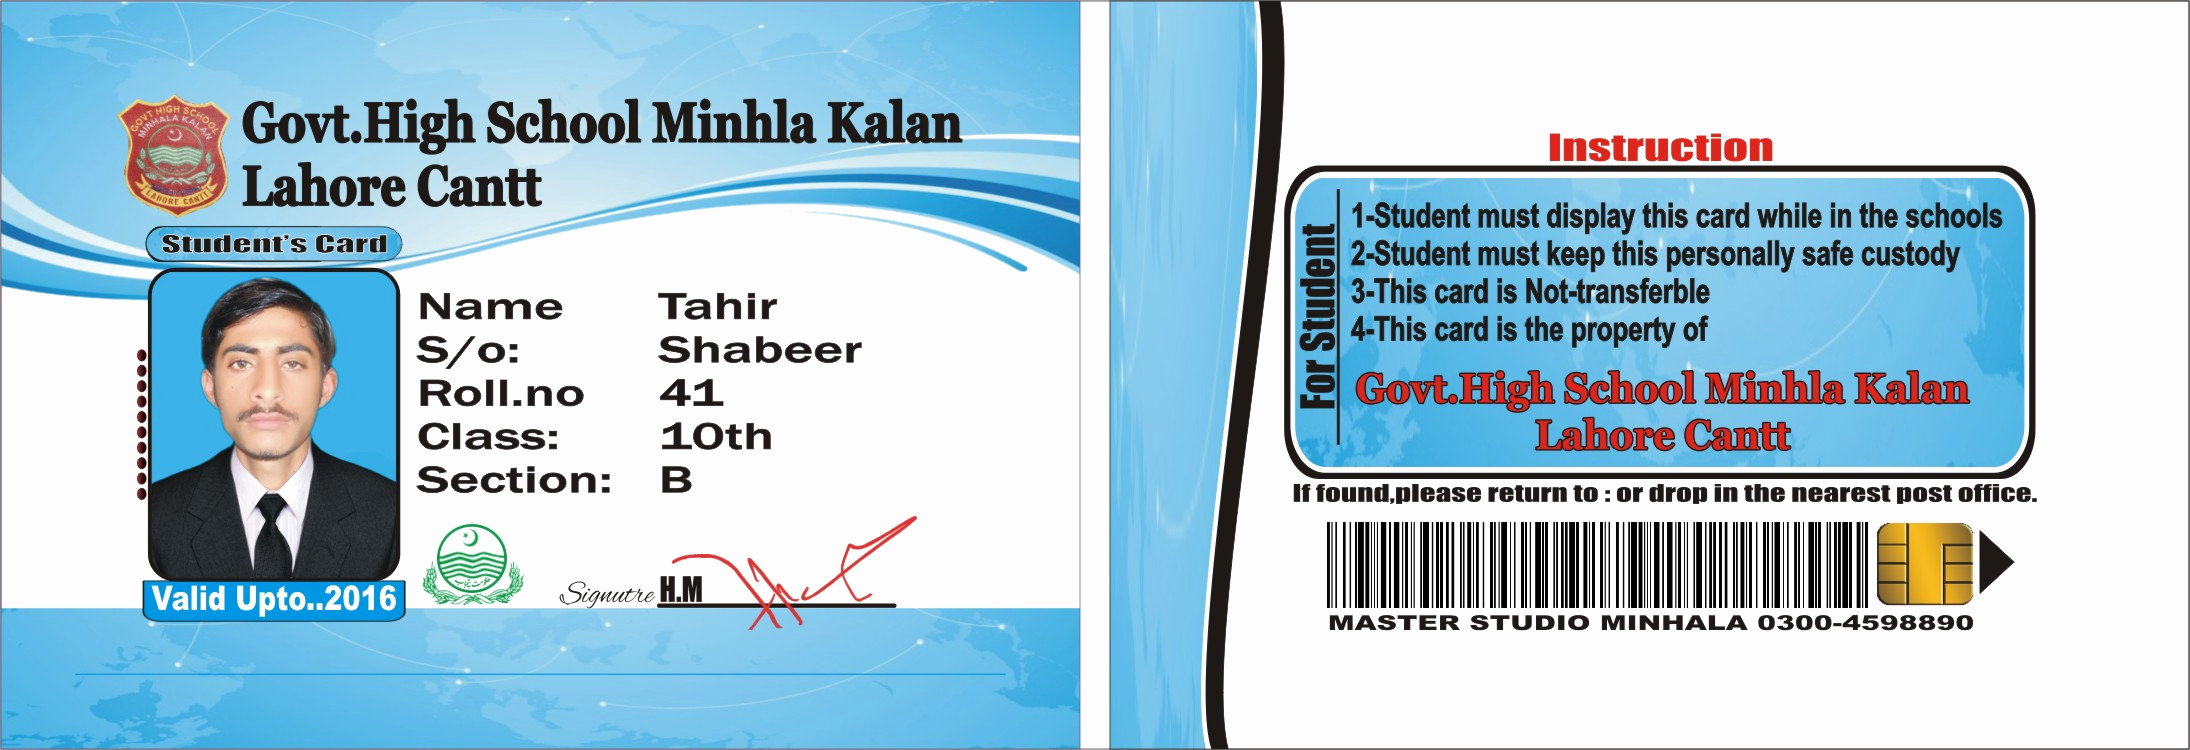 Student Id Card Template Elegant Student Cards Designs Card Maker Udent Card